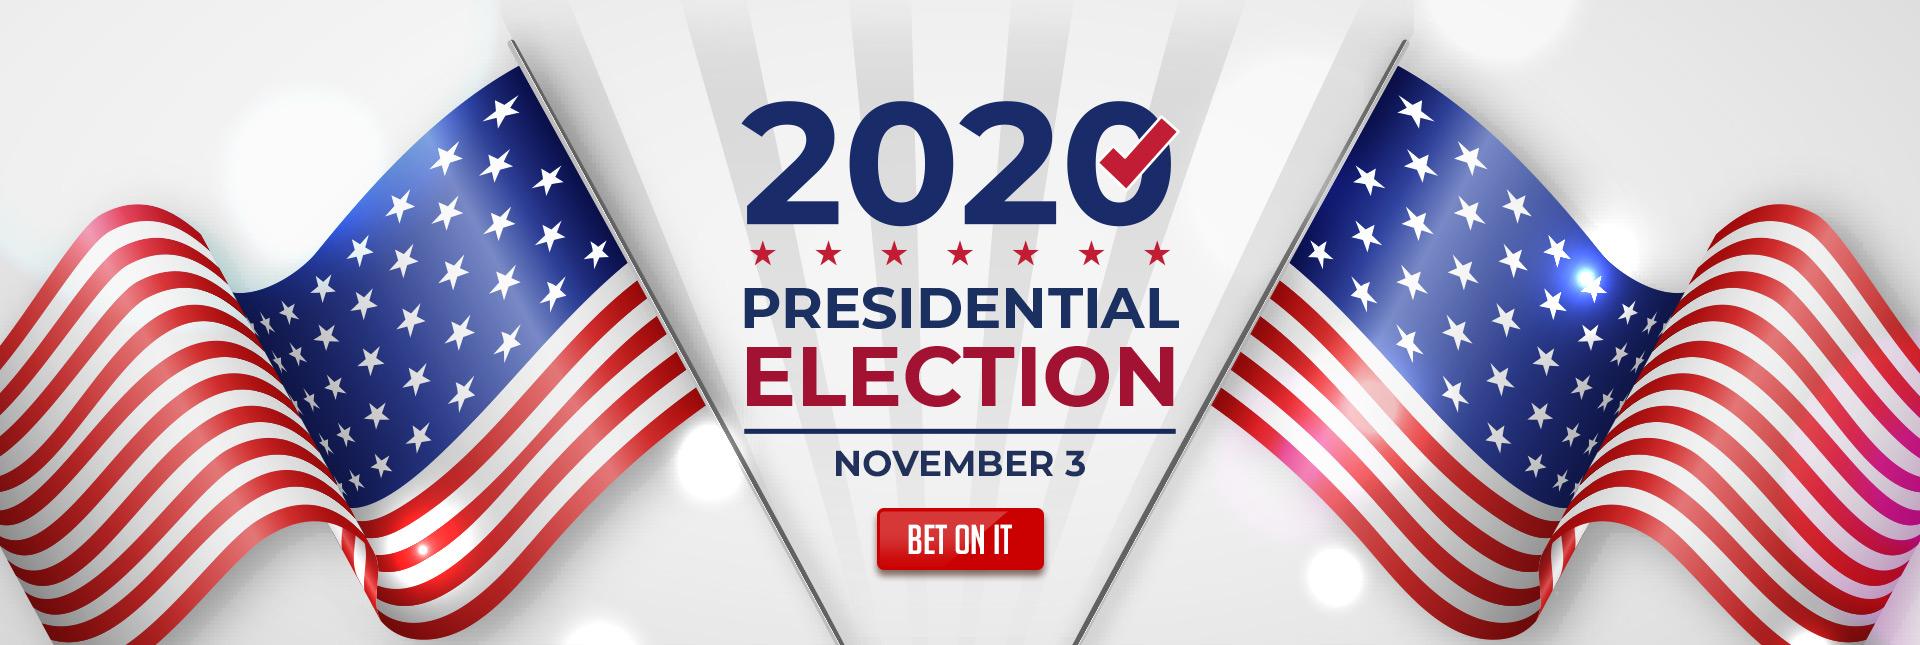 USA ELECTIONS 2020